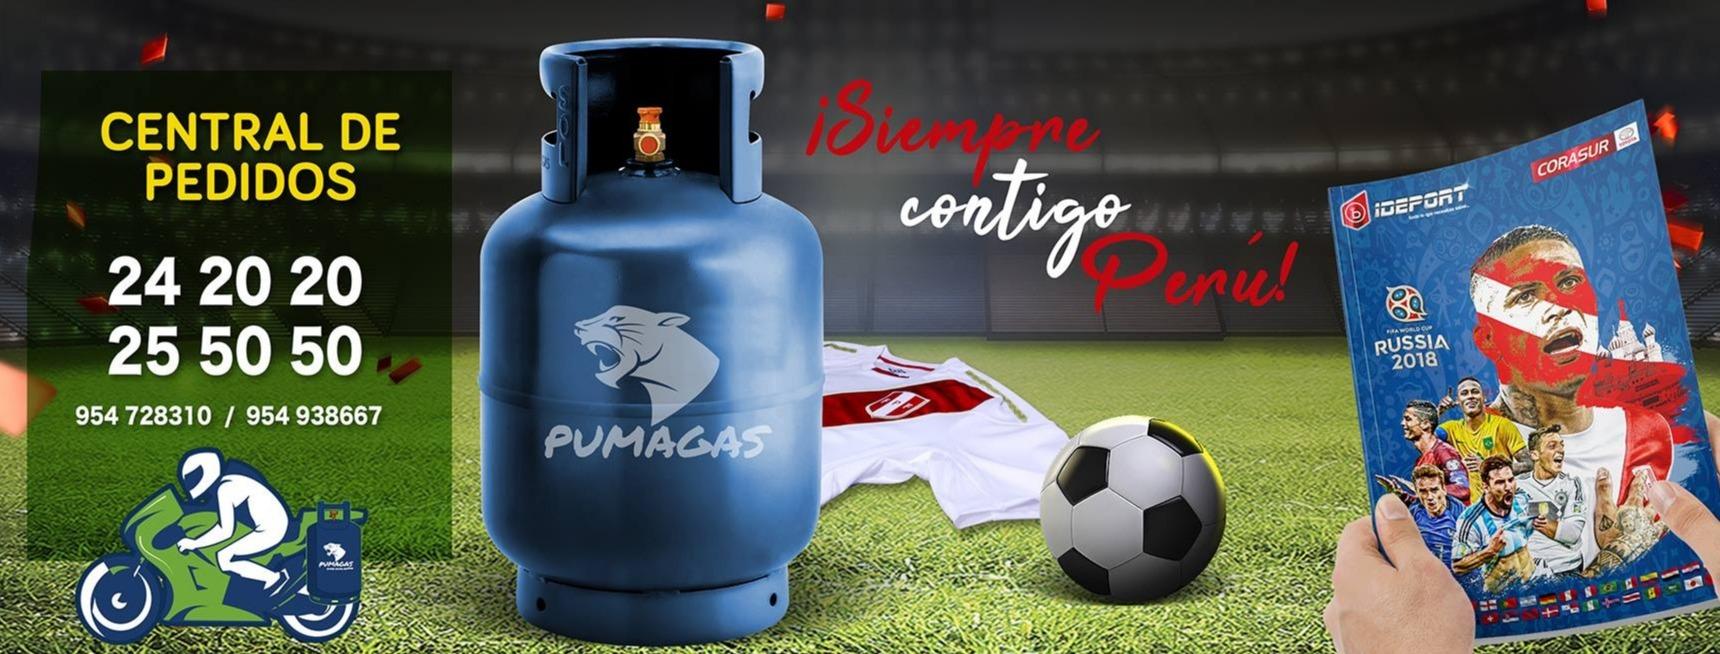 Portada PumaGas